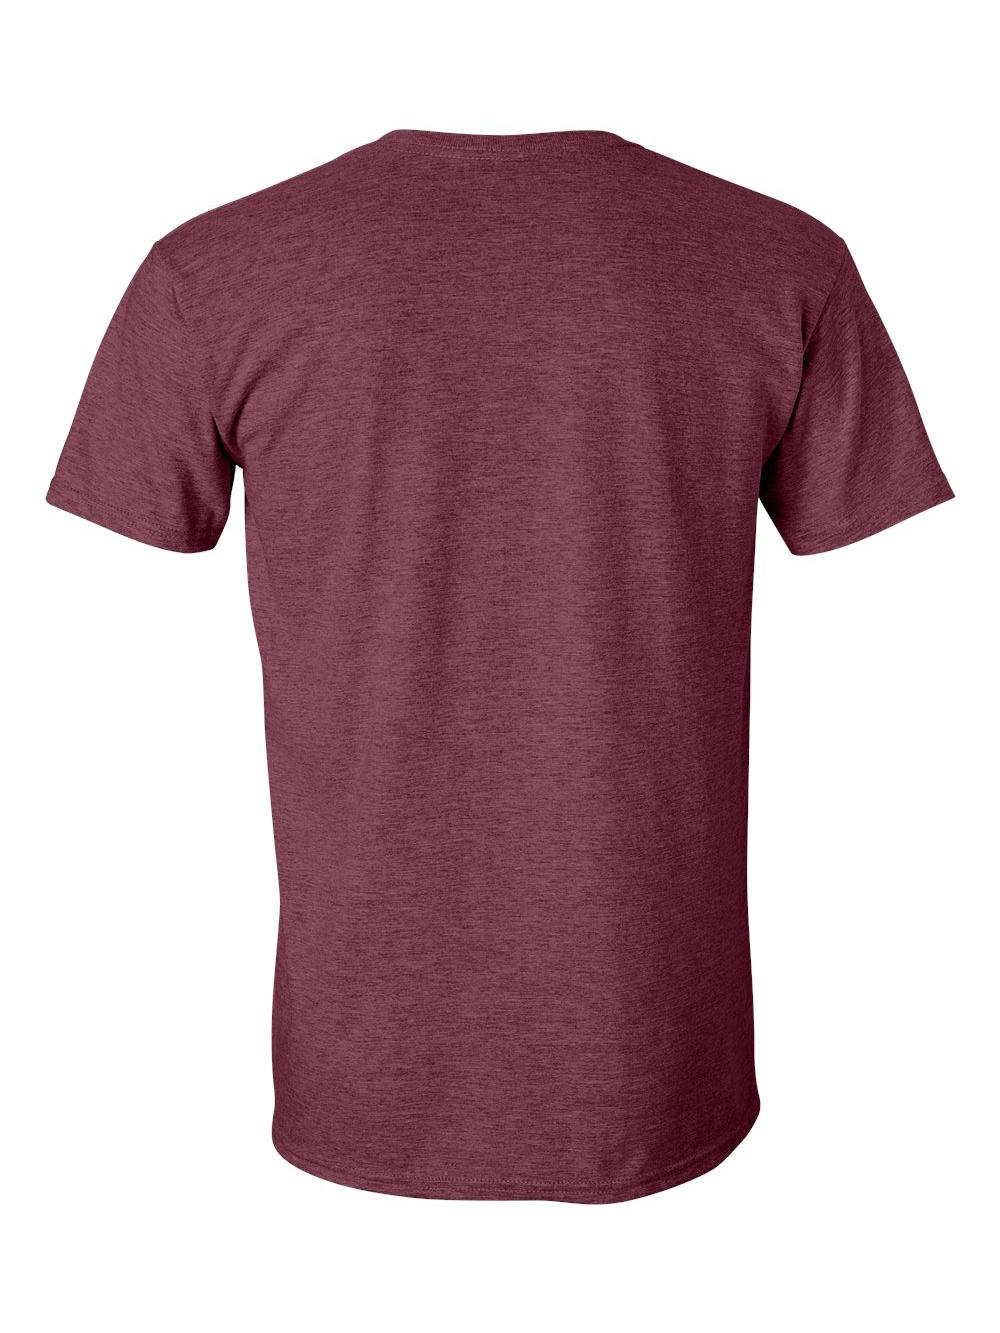 Gildan-Softstyle-T-Shirt-64000 thumbnail 79